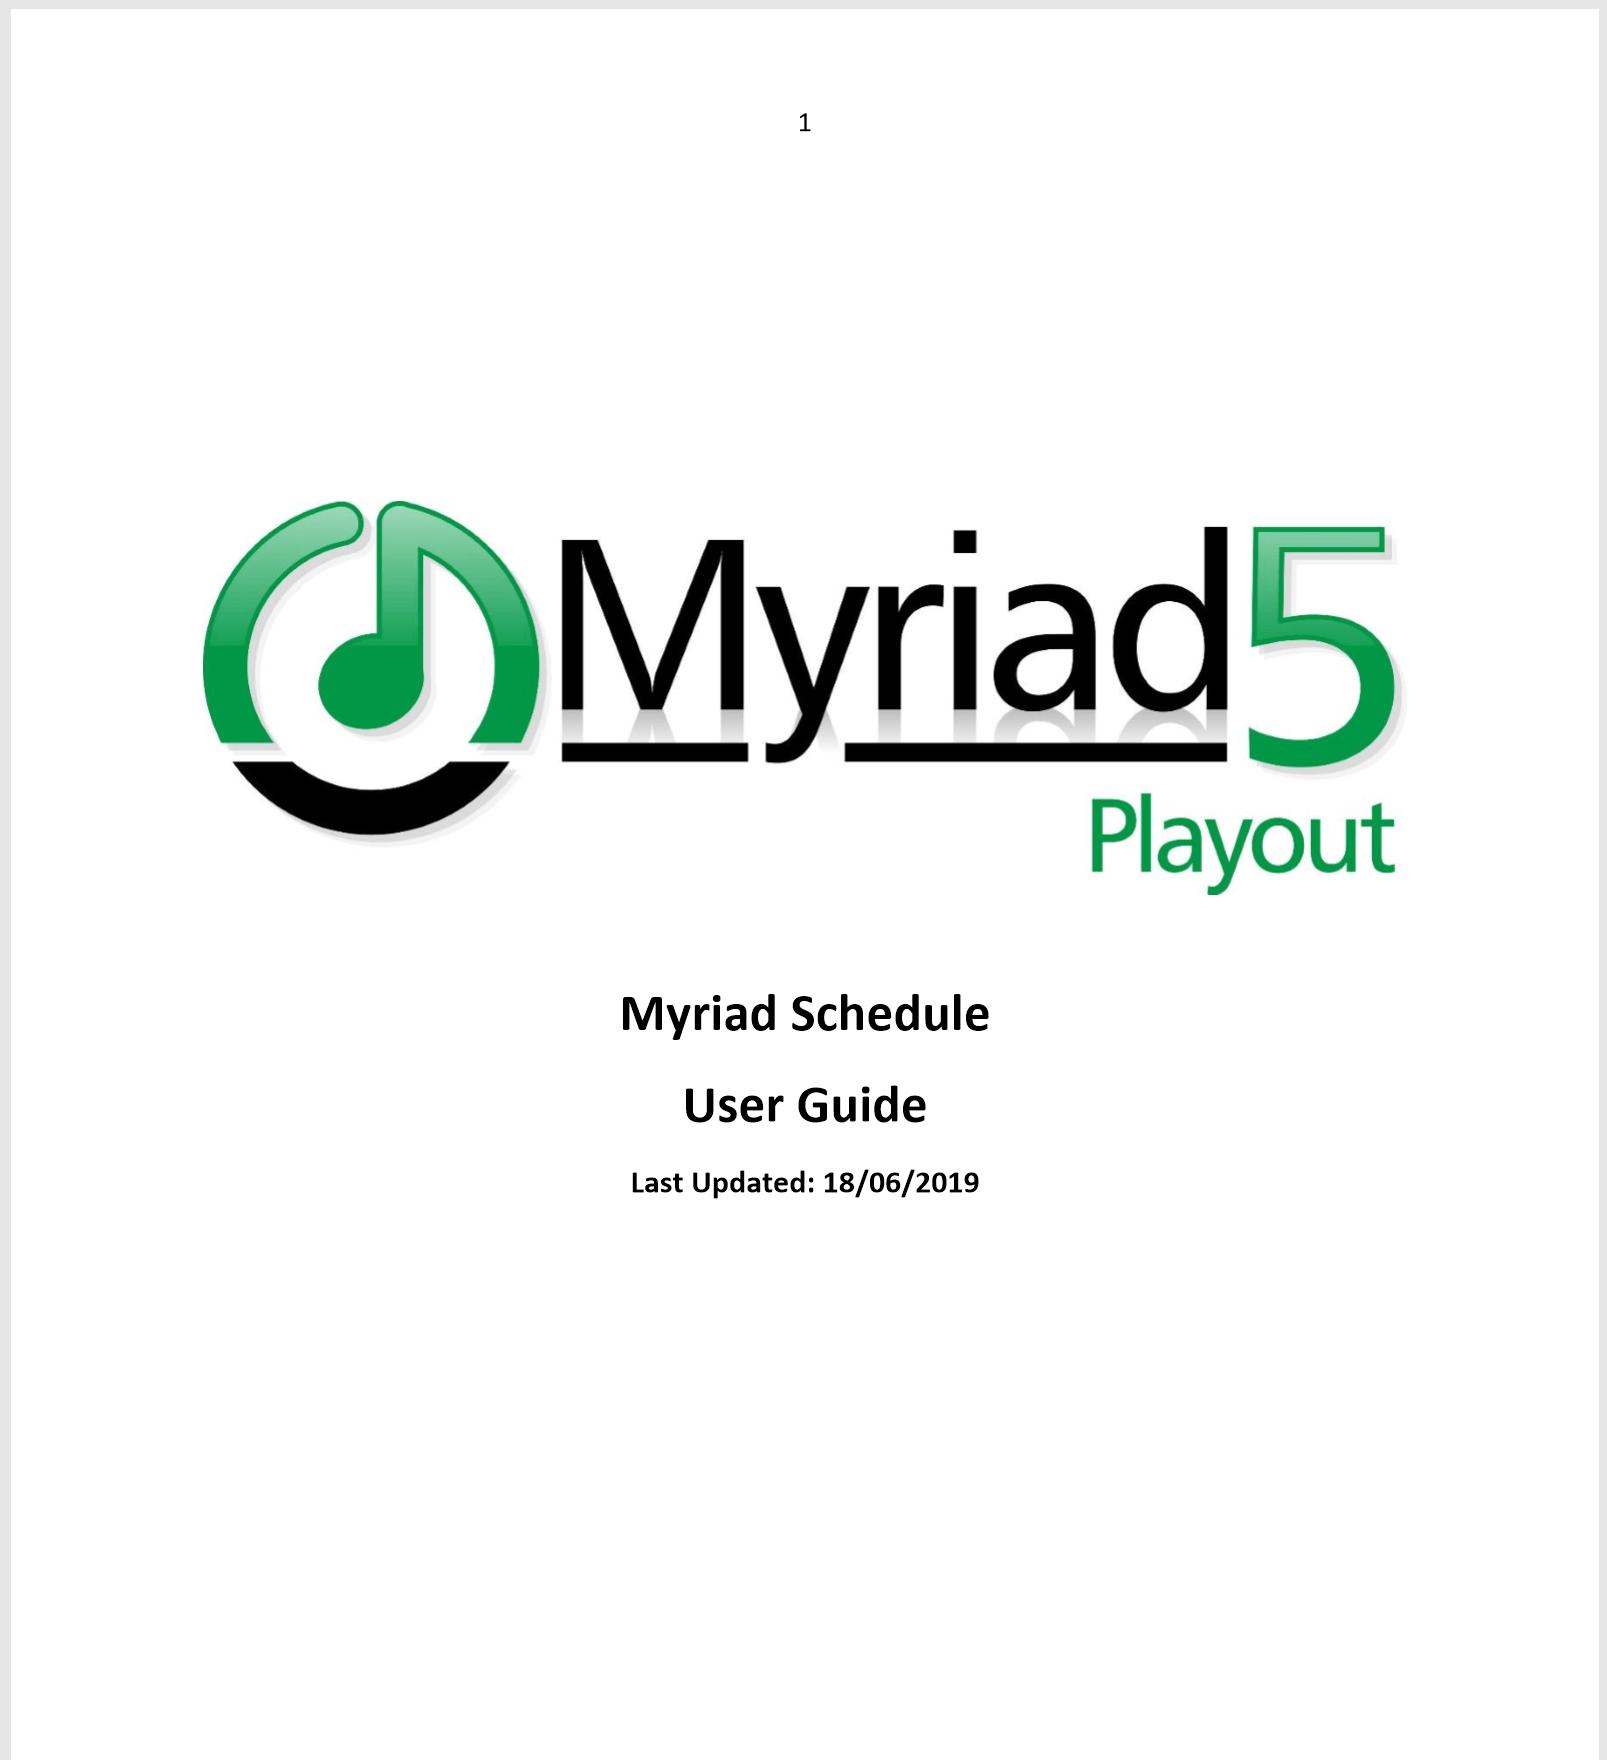 Myriad 5 Playout Support